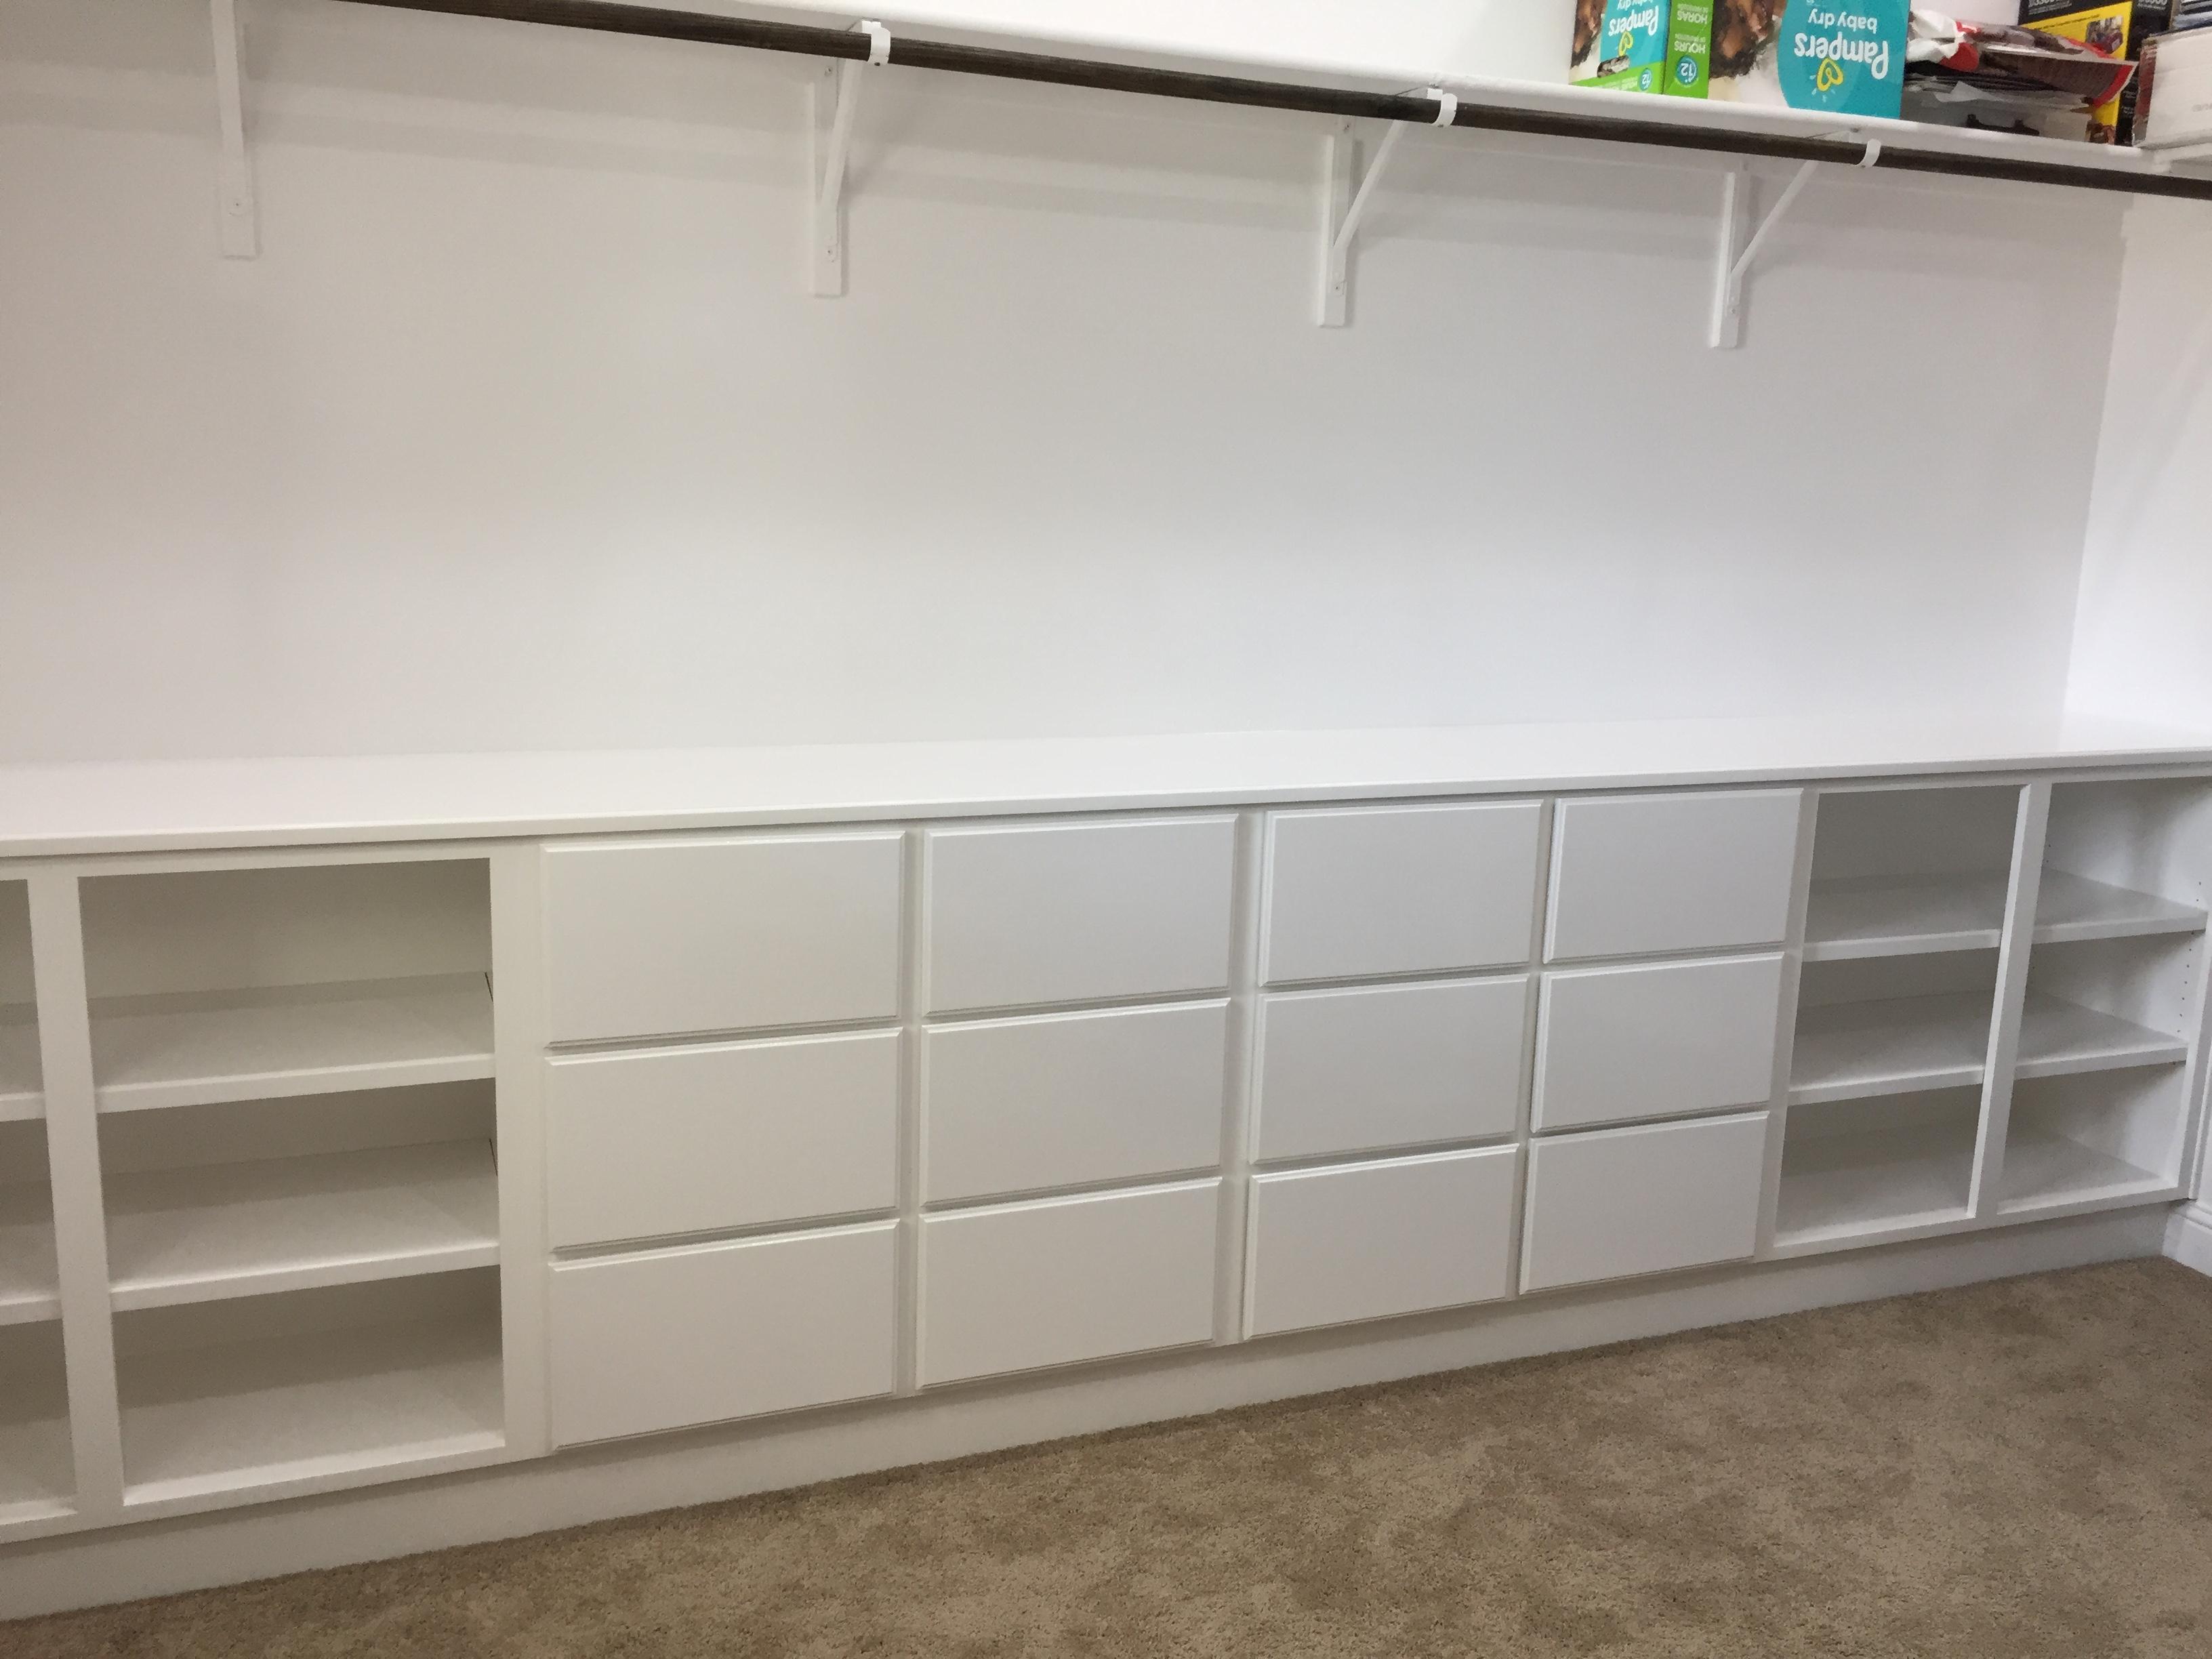 Photo of White Closet Storage With Shoe Shelves